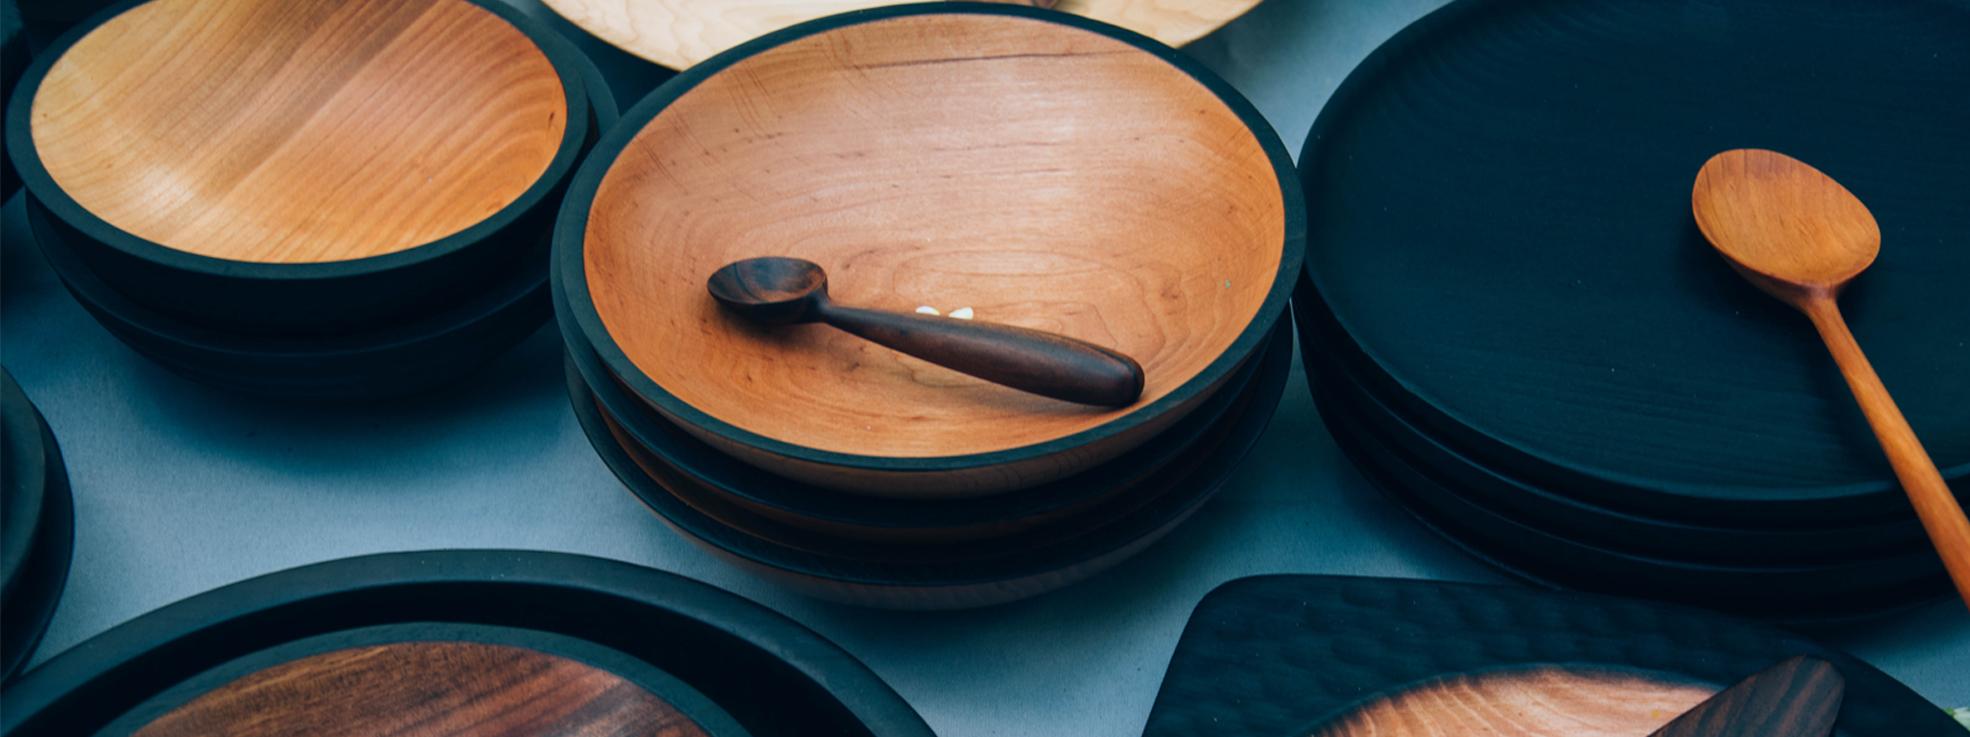 Five Basic Kitchen Tools